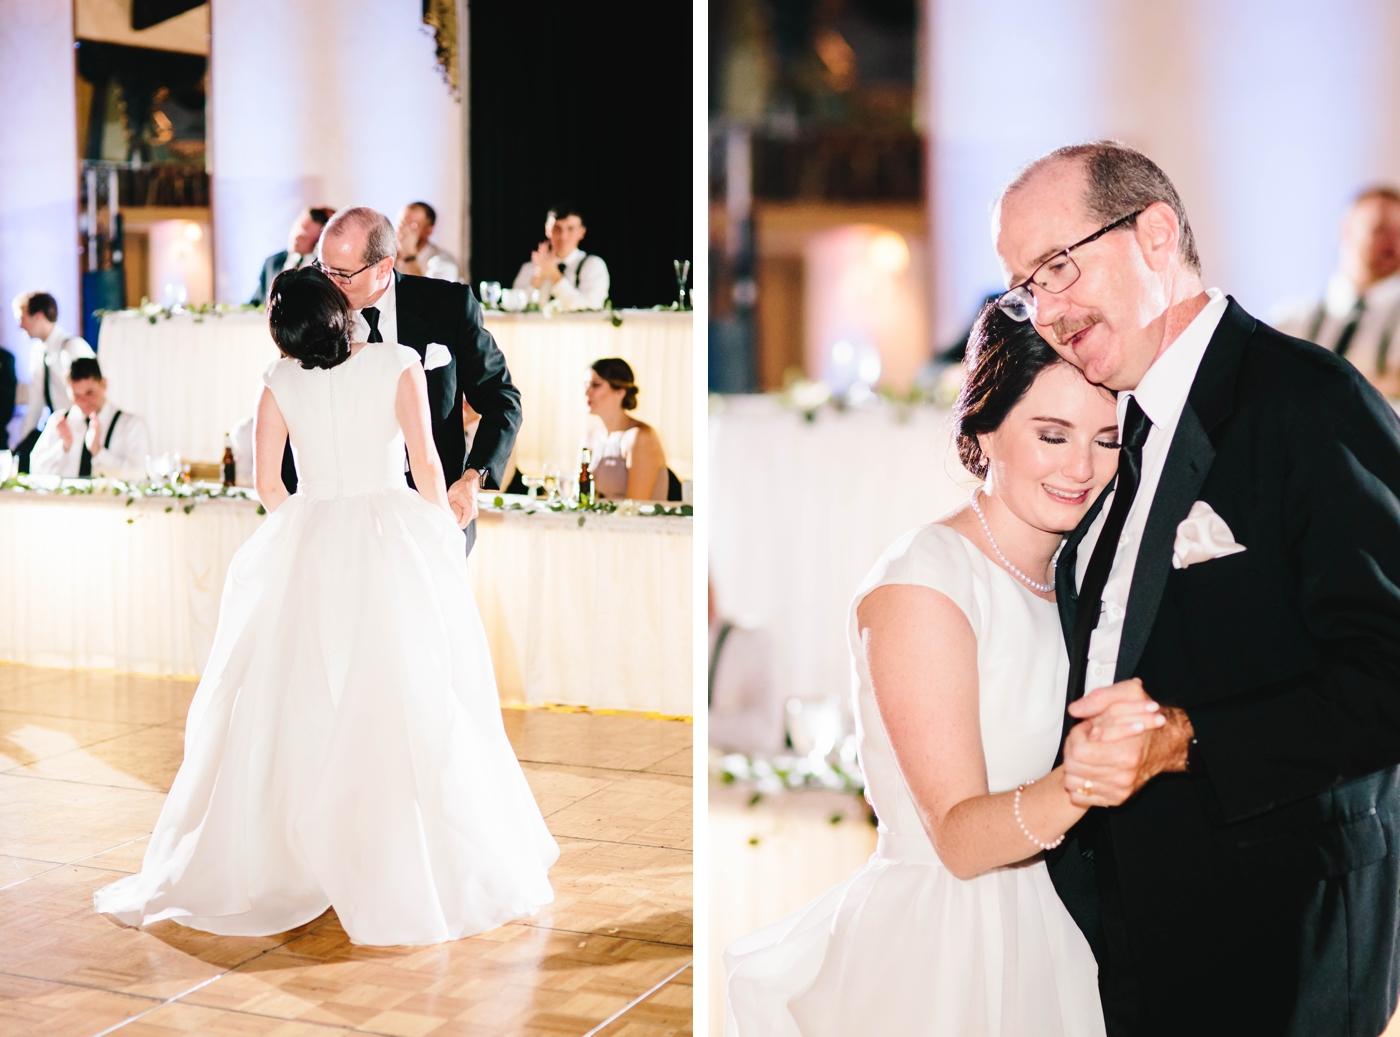 chicago-fine-art-wedding-photography-mccarthy68